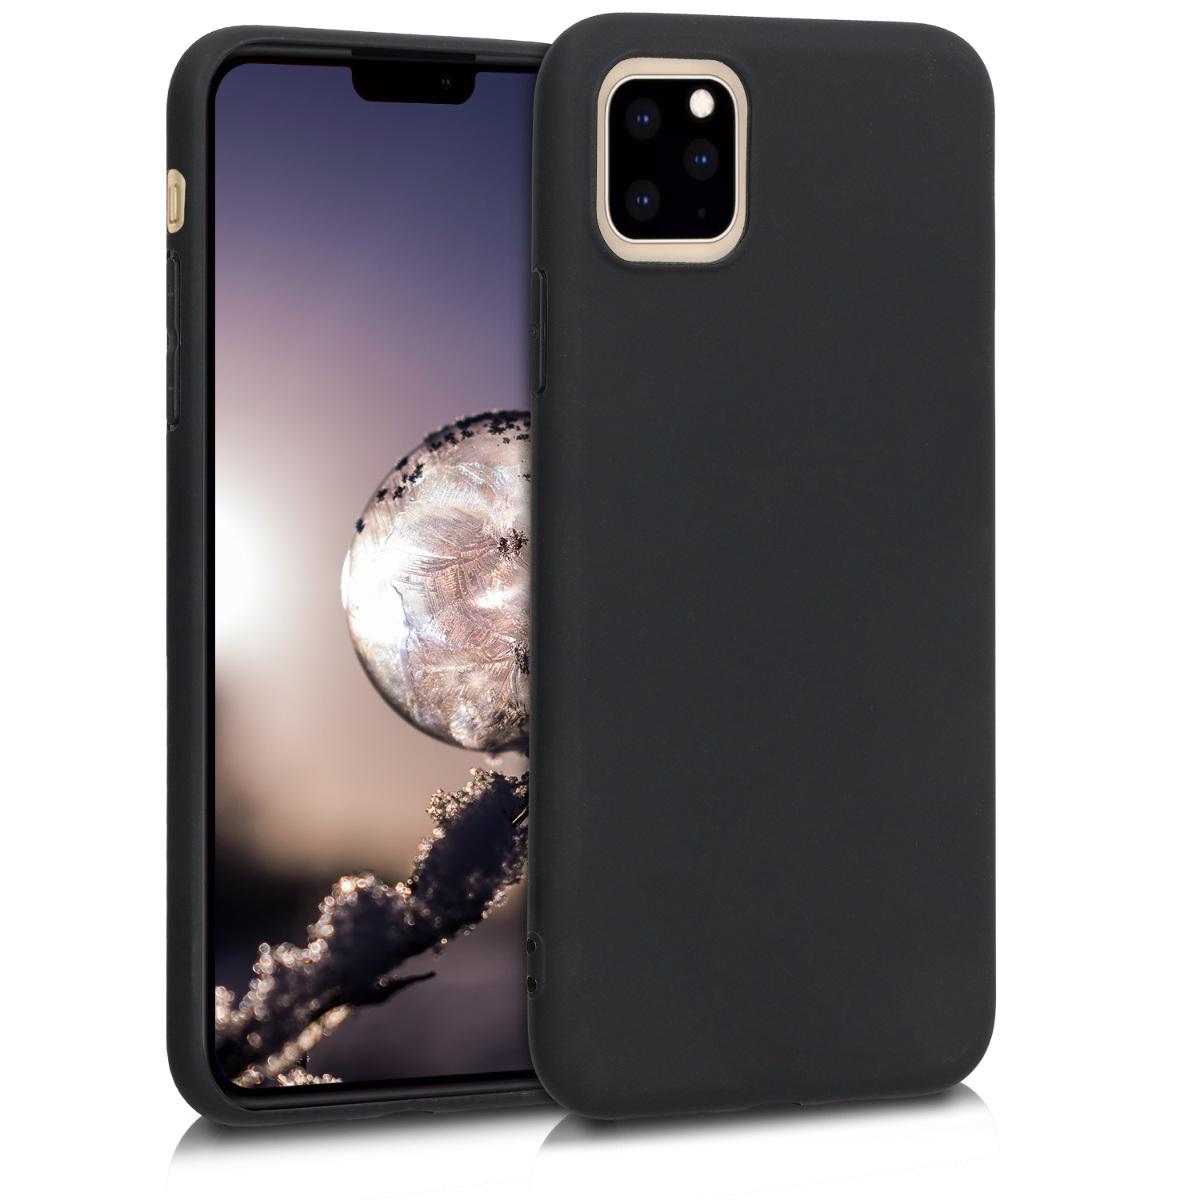 KW Θήκη Σιλικόνης iPhone 11 Pro - Black Matte (49788.47)